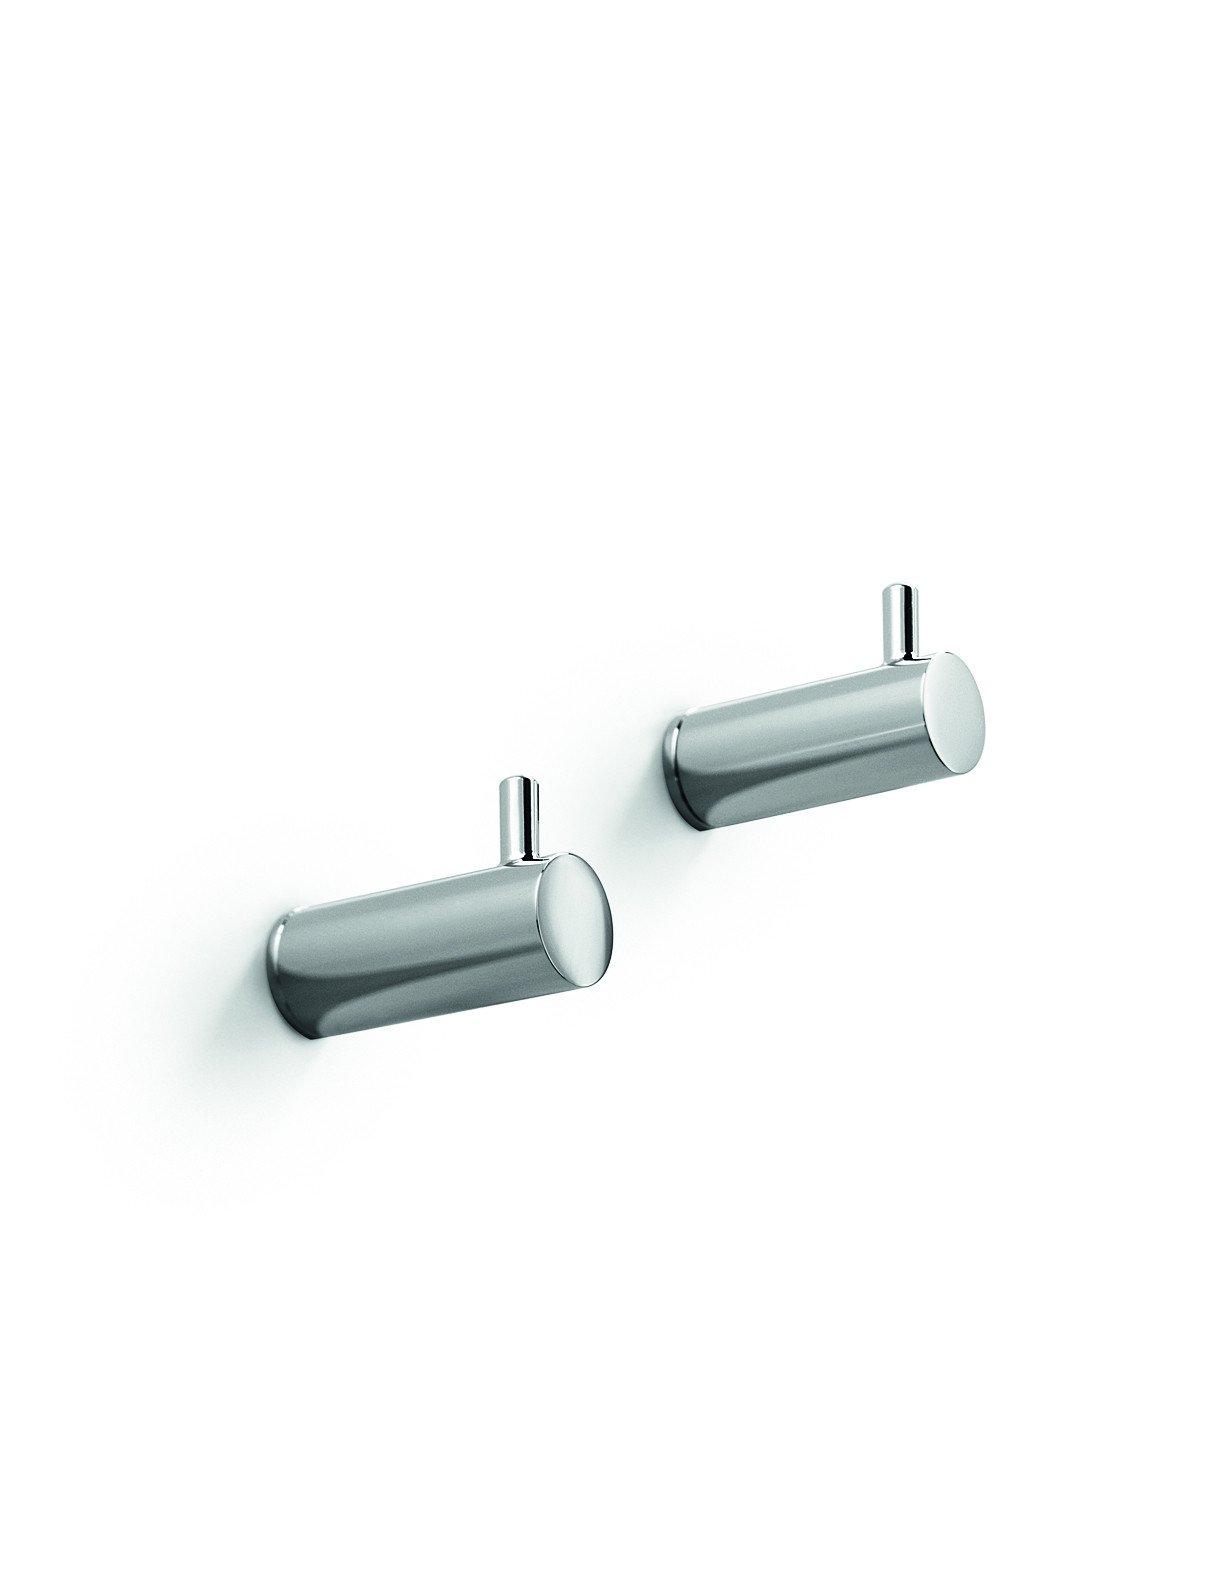 LB Picola Brass Double Towel Robe Hook Towel Hanger set of 2 for Bath, Chrome